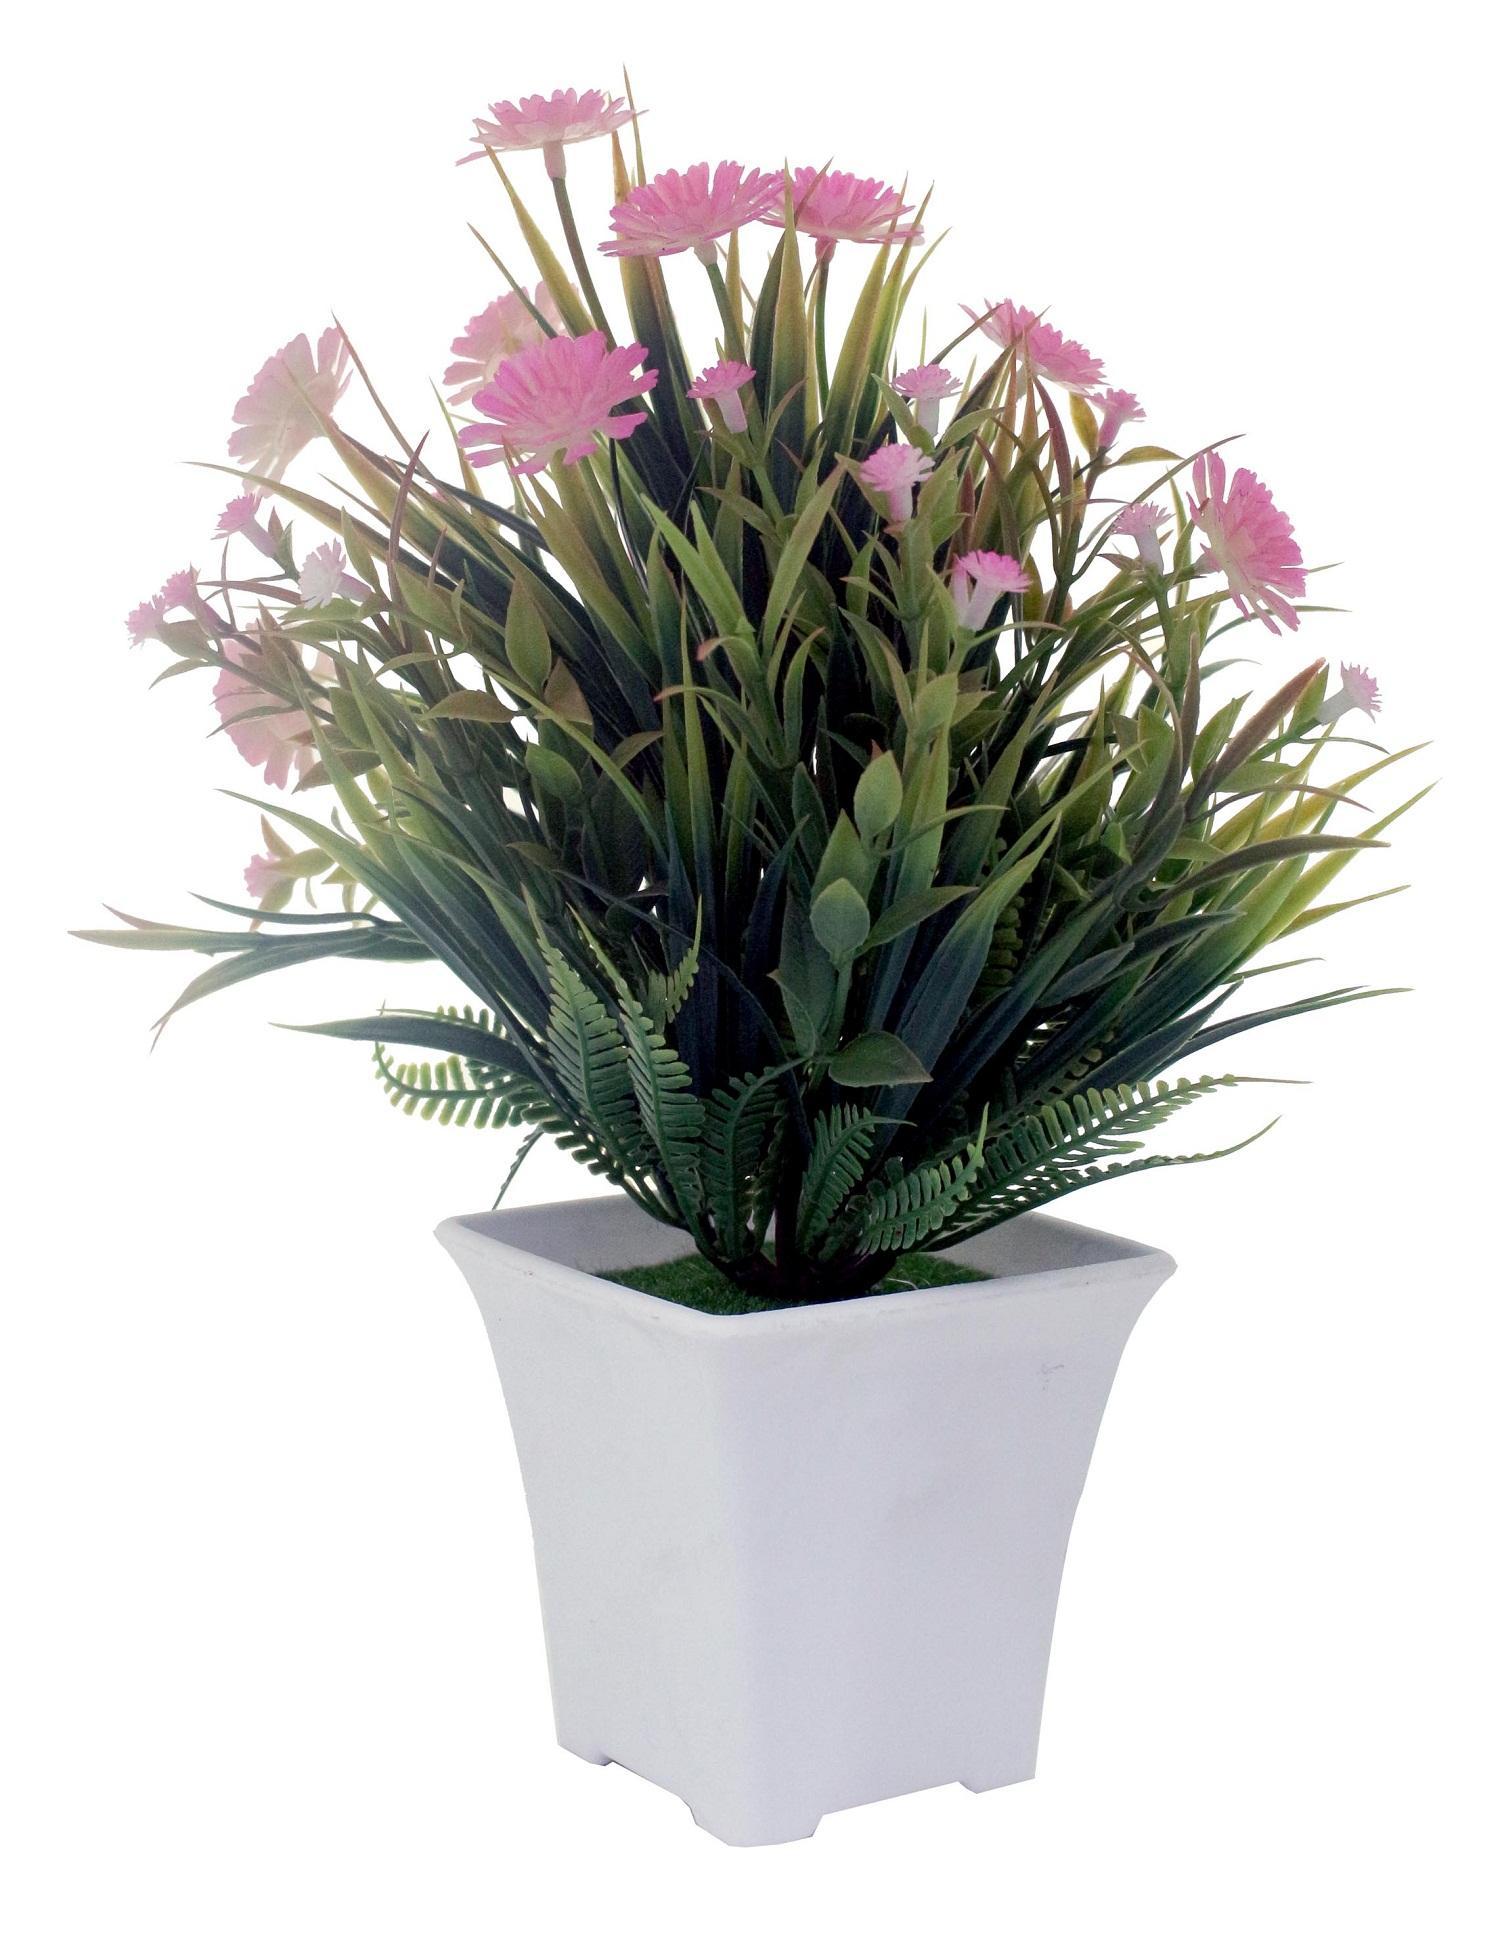 JYSK Tanaman Palsu ARTIFICIAL PLANT 17D038 8X8XH24CM